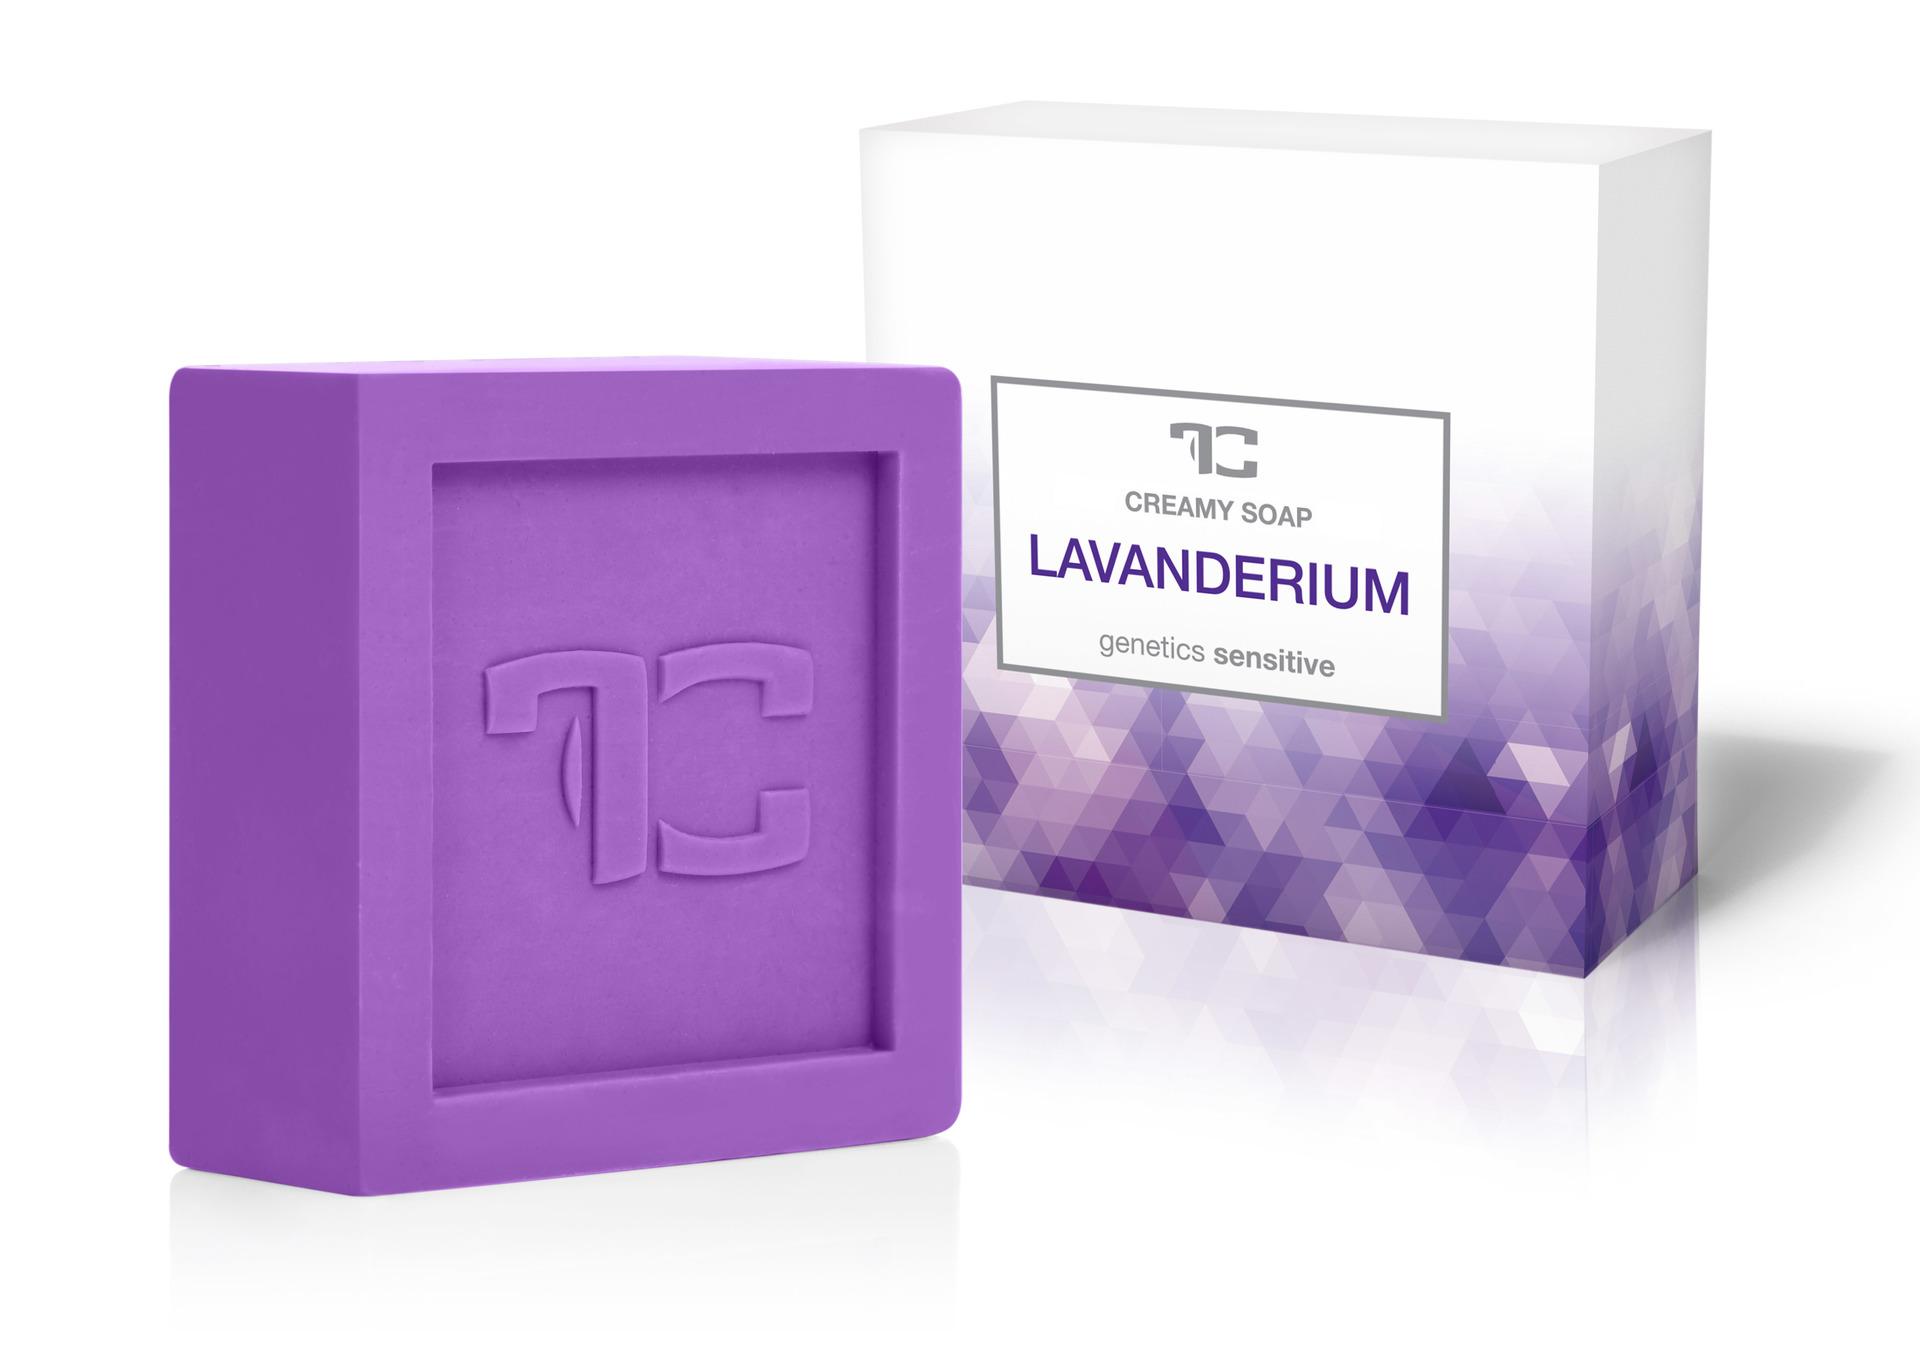 LAVANDERIUM rostlinné krémové mýdlo s levandulovým extraktem